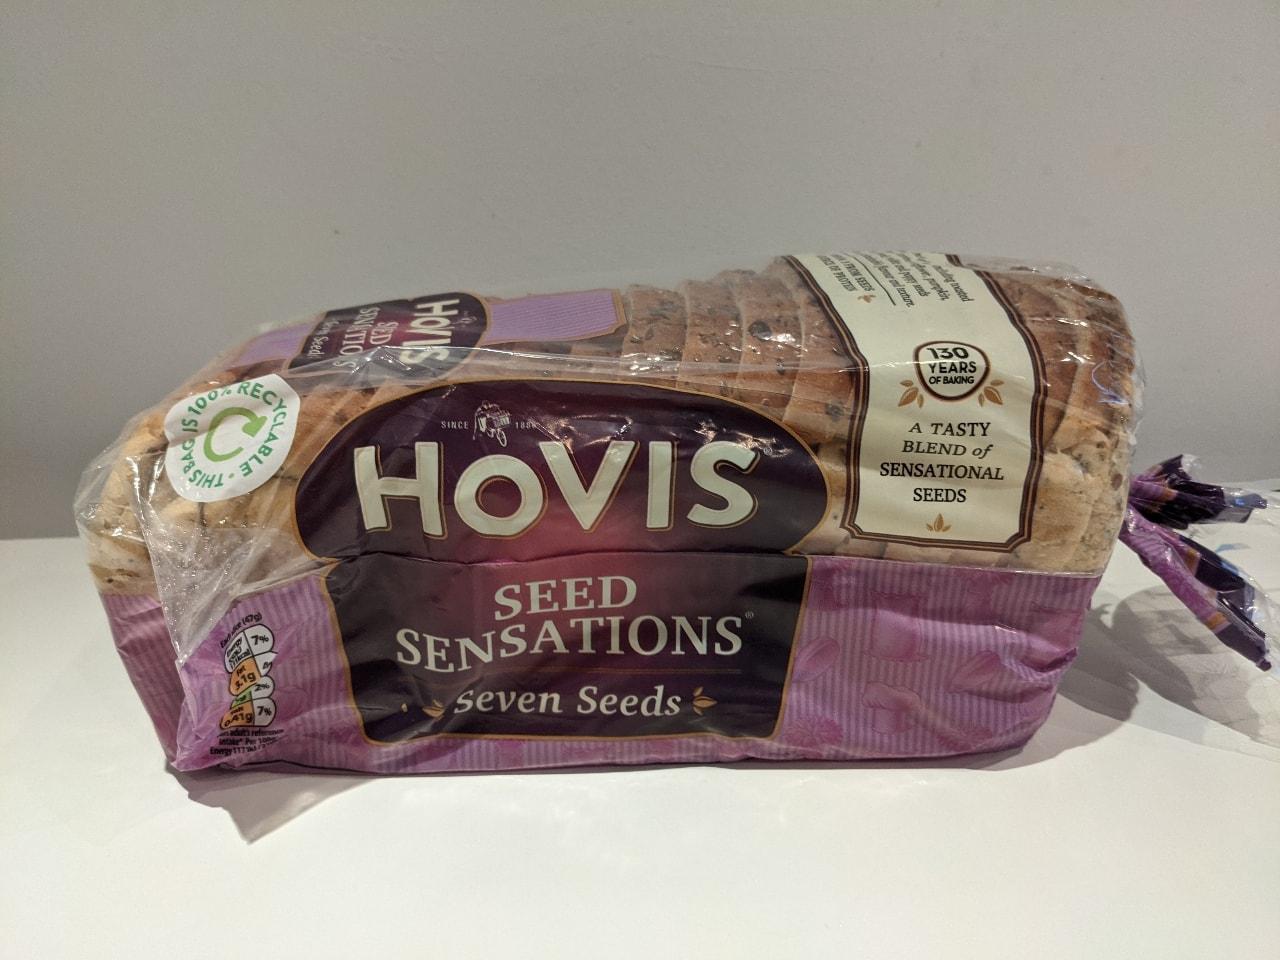 Hovis seed sensations loaf courtesy of Tesco